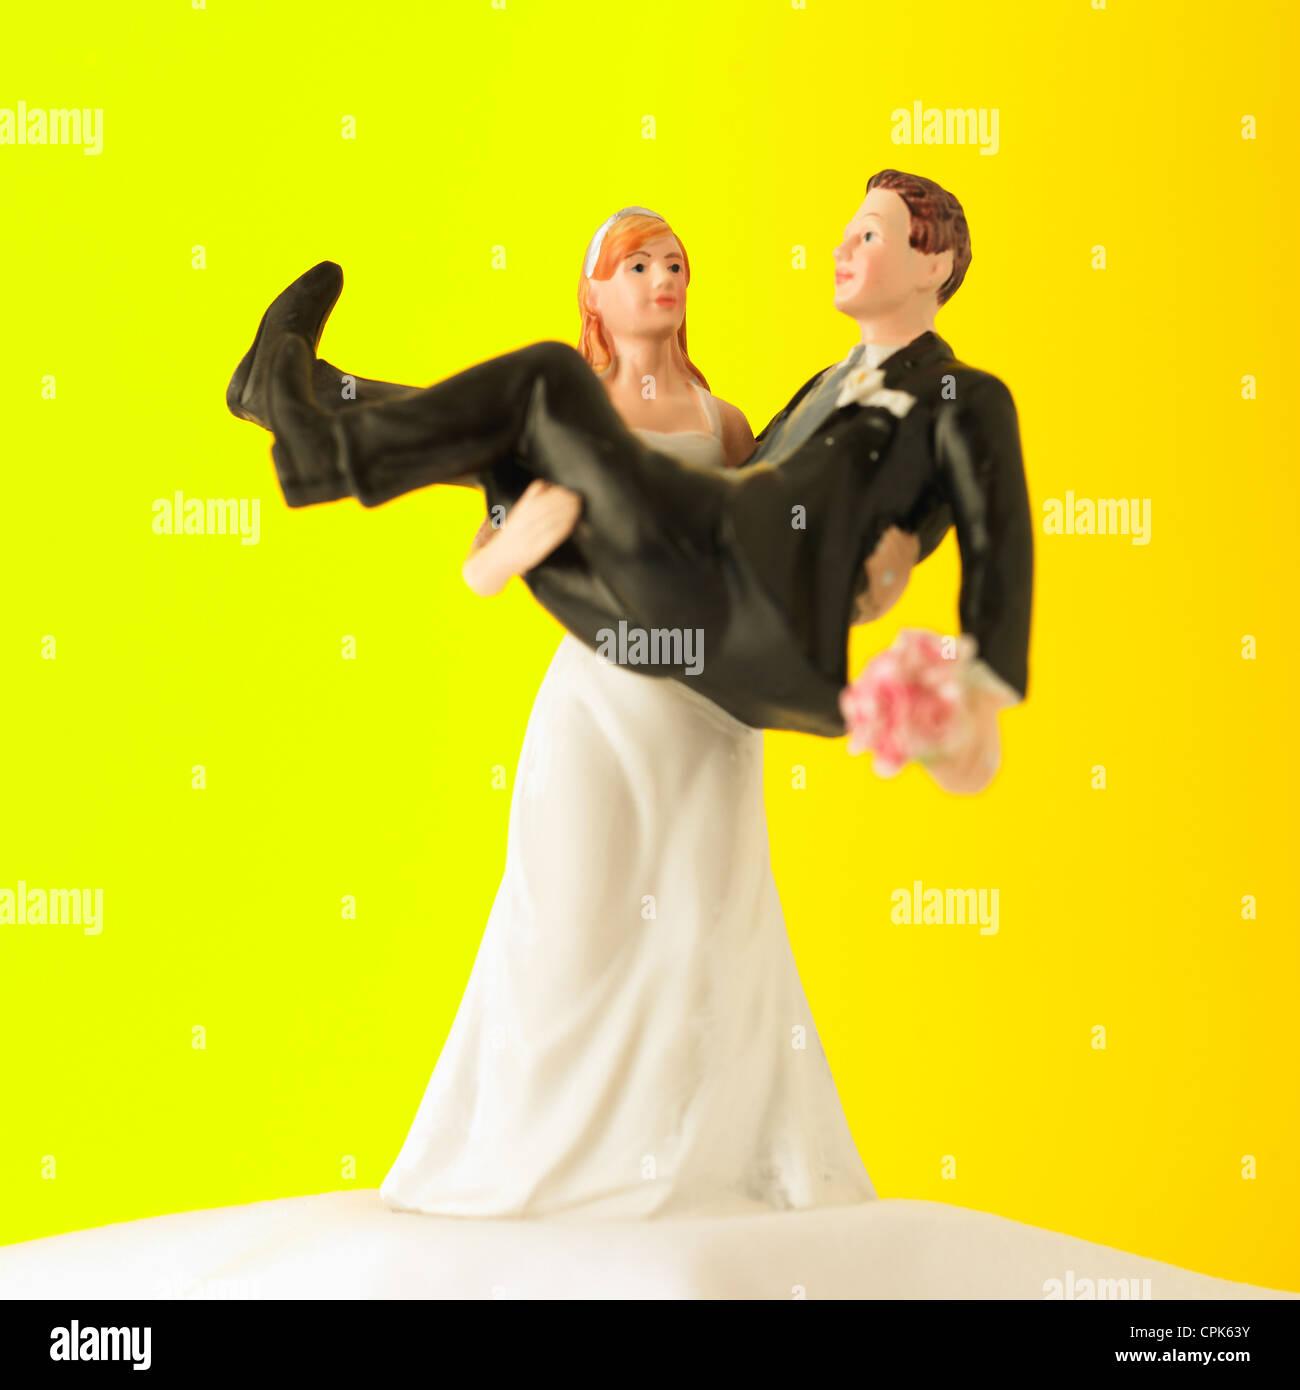 Wedding Cake Topper Stock Photos & Wedding Cake Topper Stock Images ...